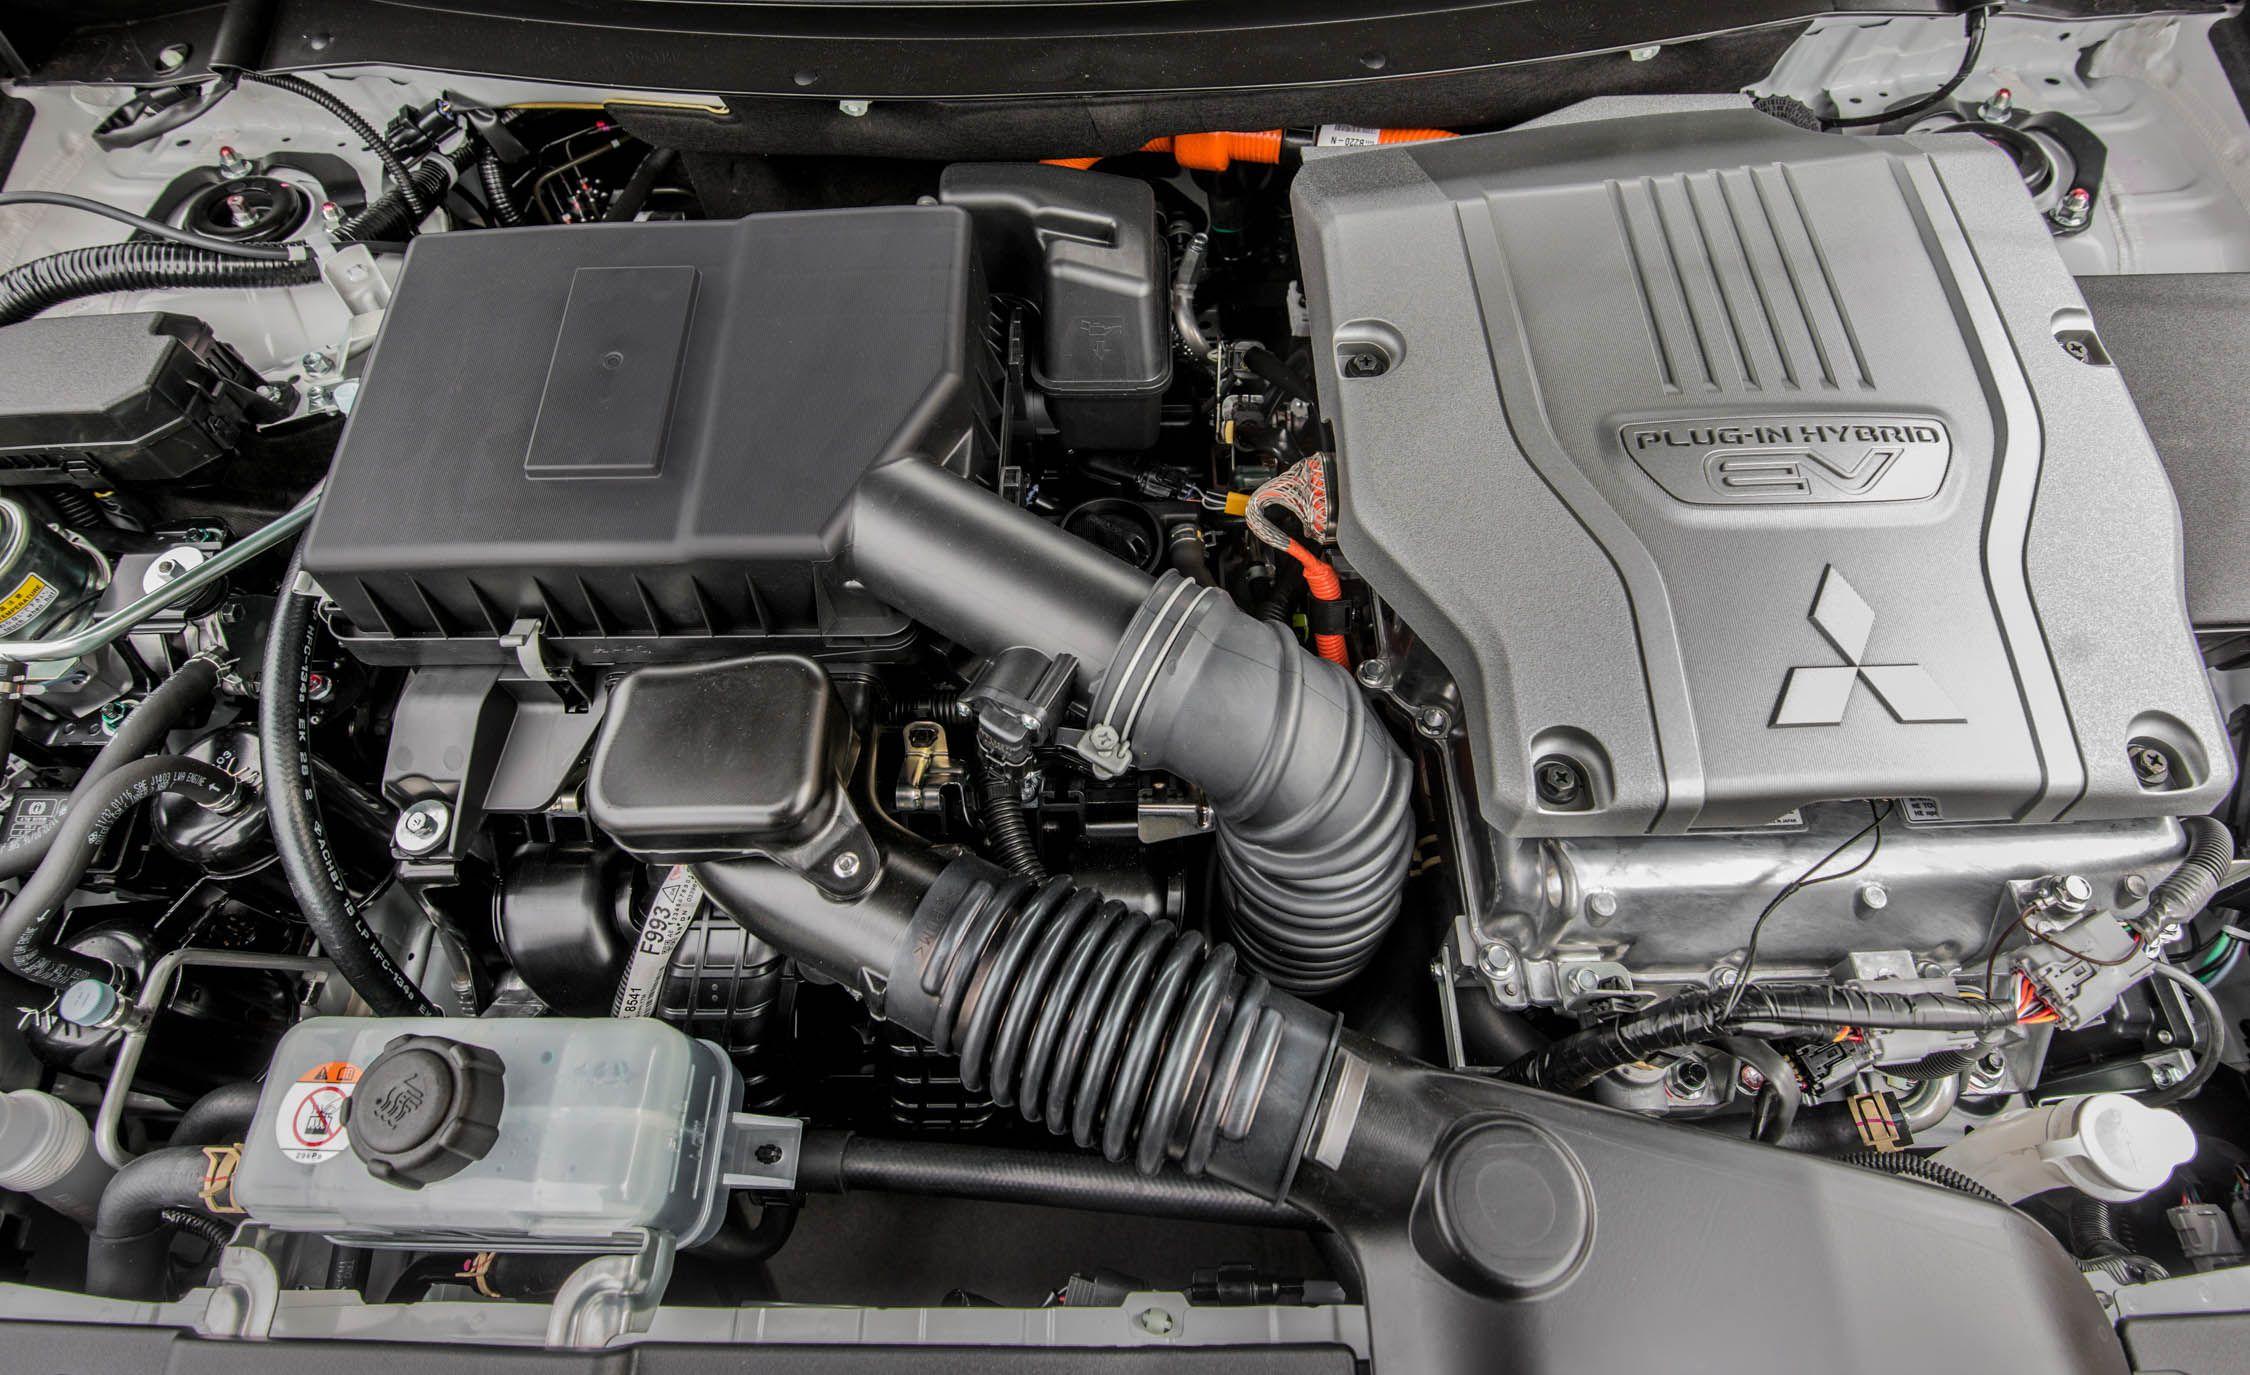 2019 Mitsubishi Outlander Reviews | Mitsubishi Outlander Price, Photos, and Specs | Car and Driver